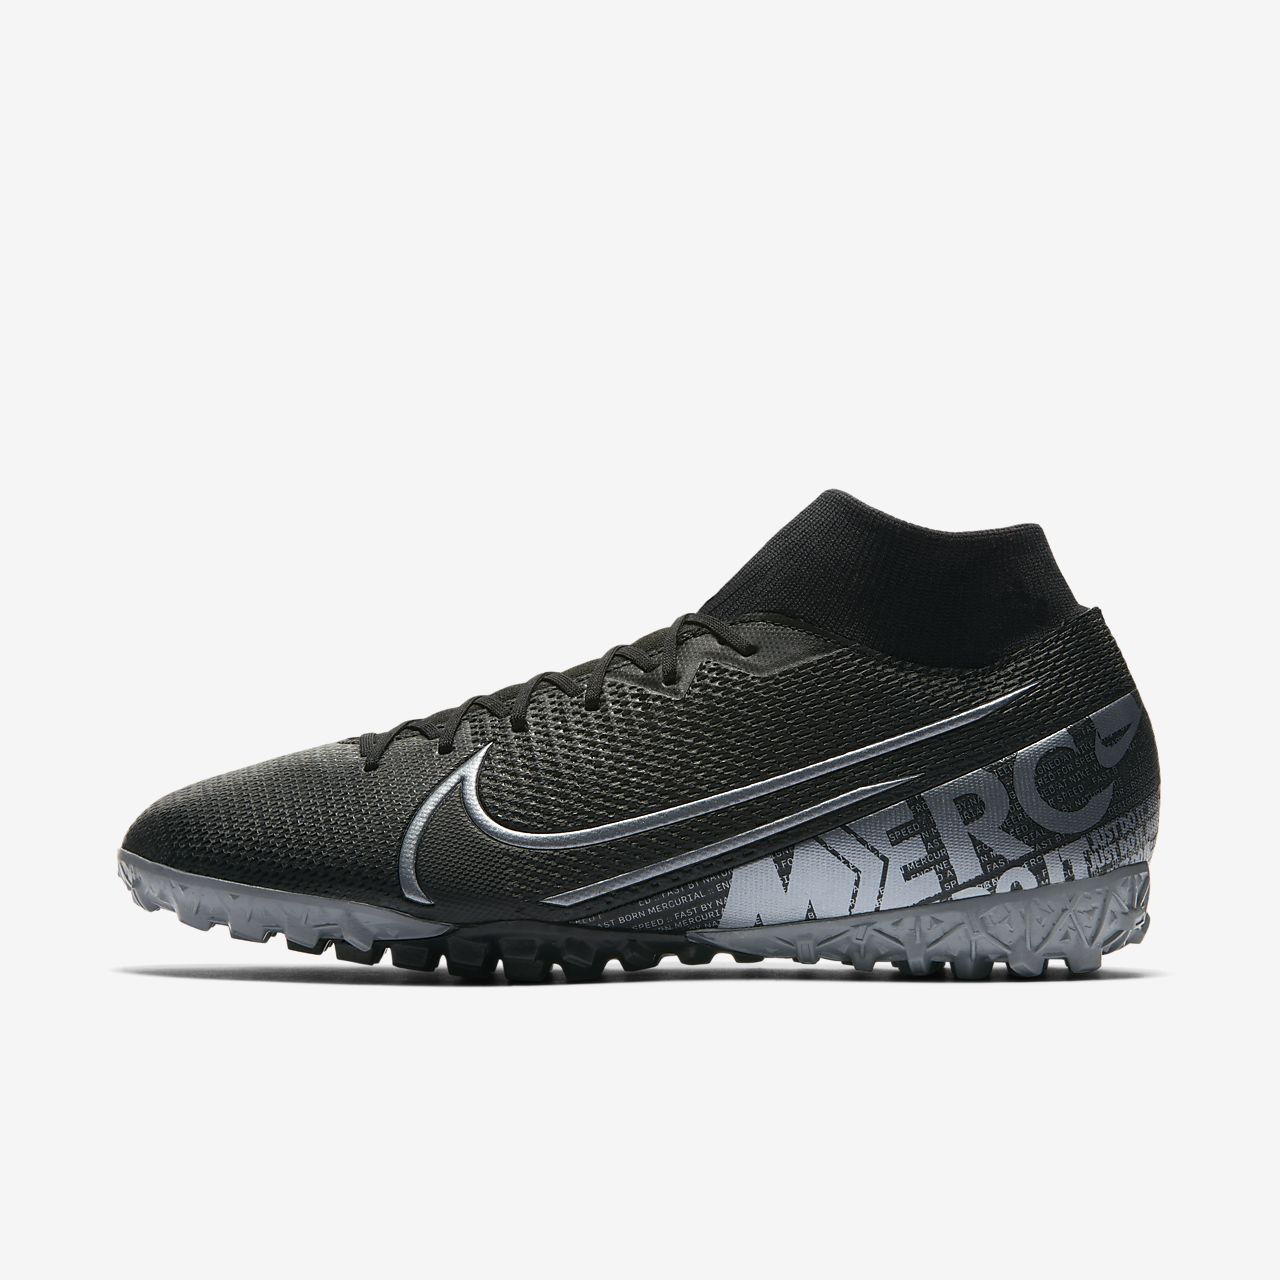 Calzado de fútbol Nike MercurialX Superfly 7 Academy para terreno artificial